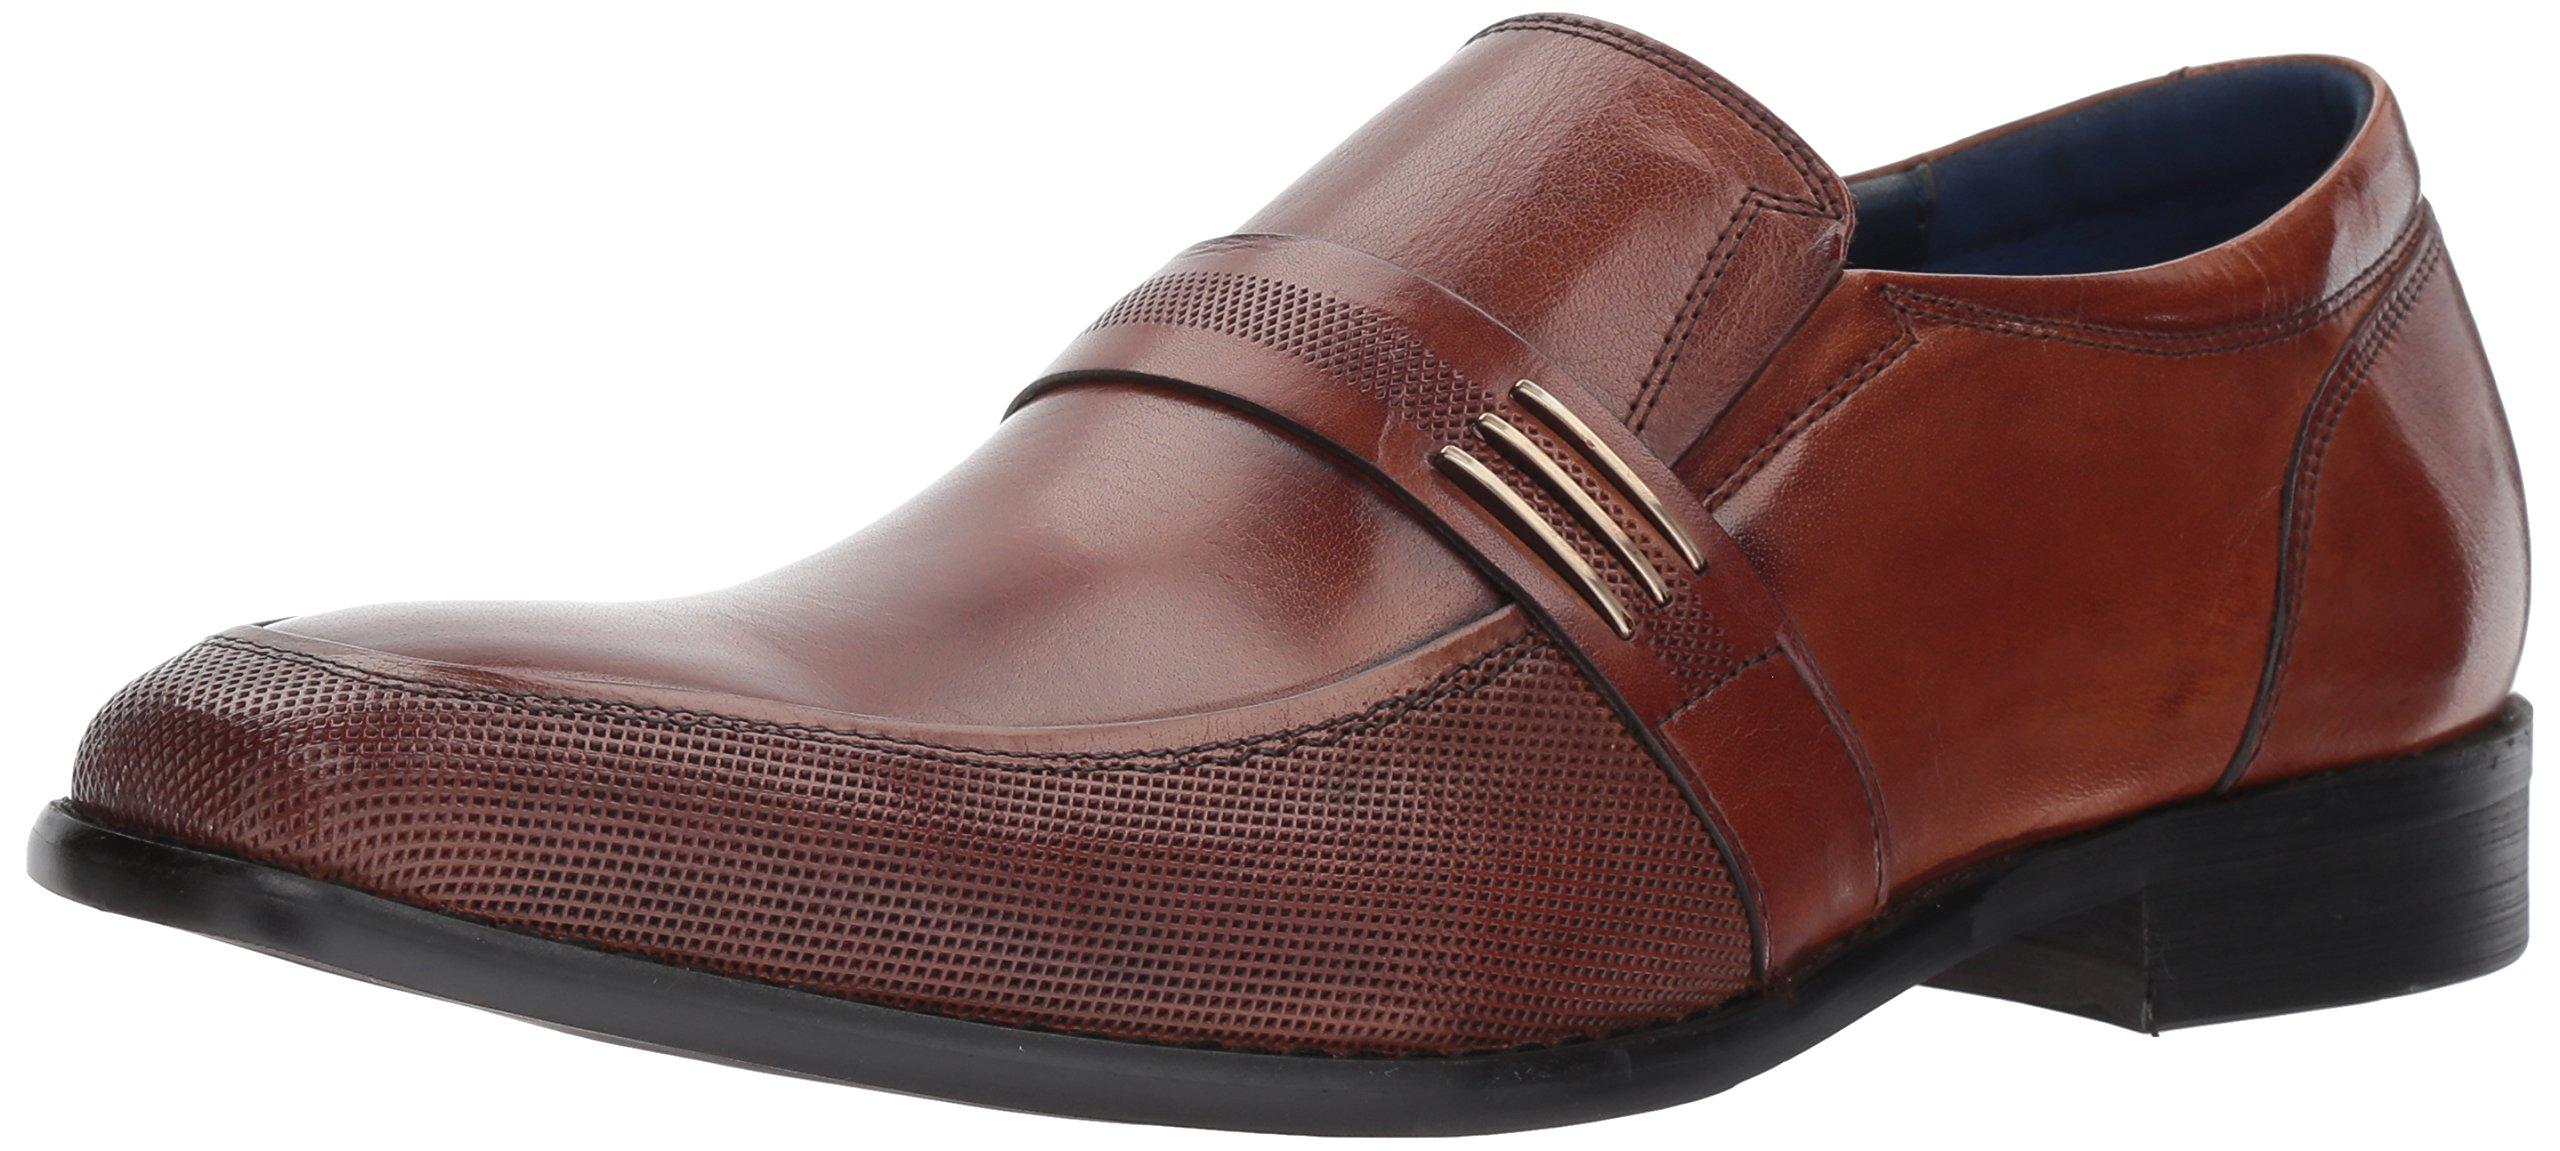 Steve Madden Men's Othello Loafer, Cognac Leather, 12 M US